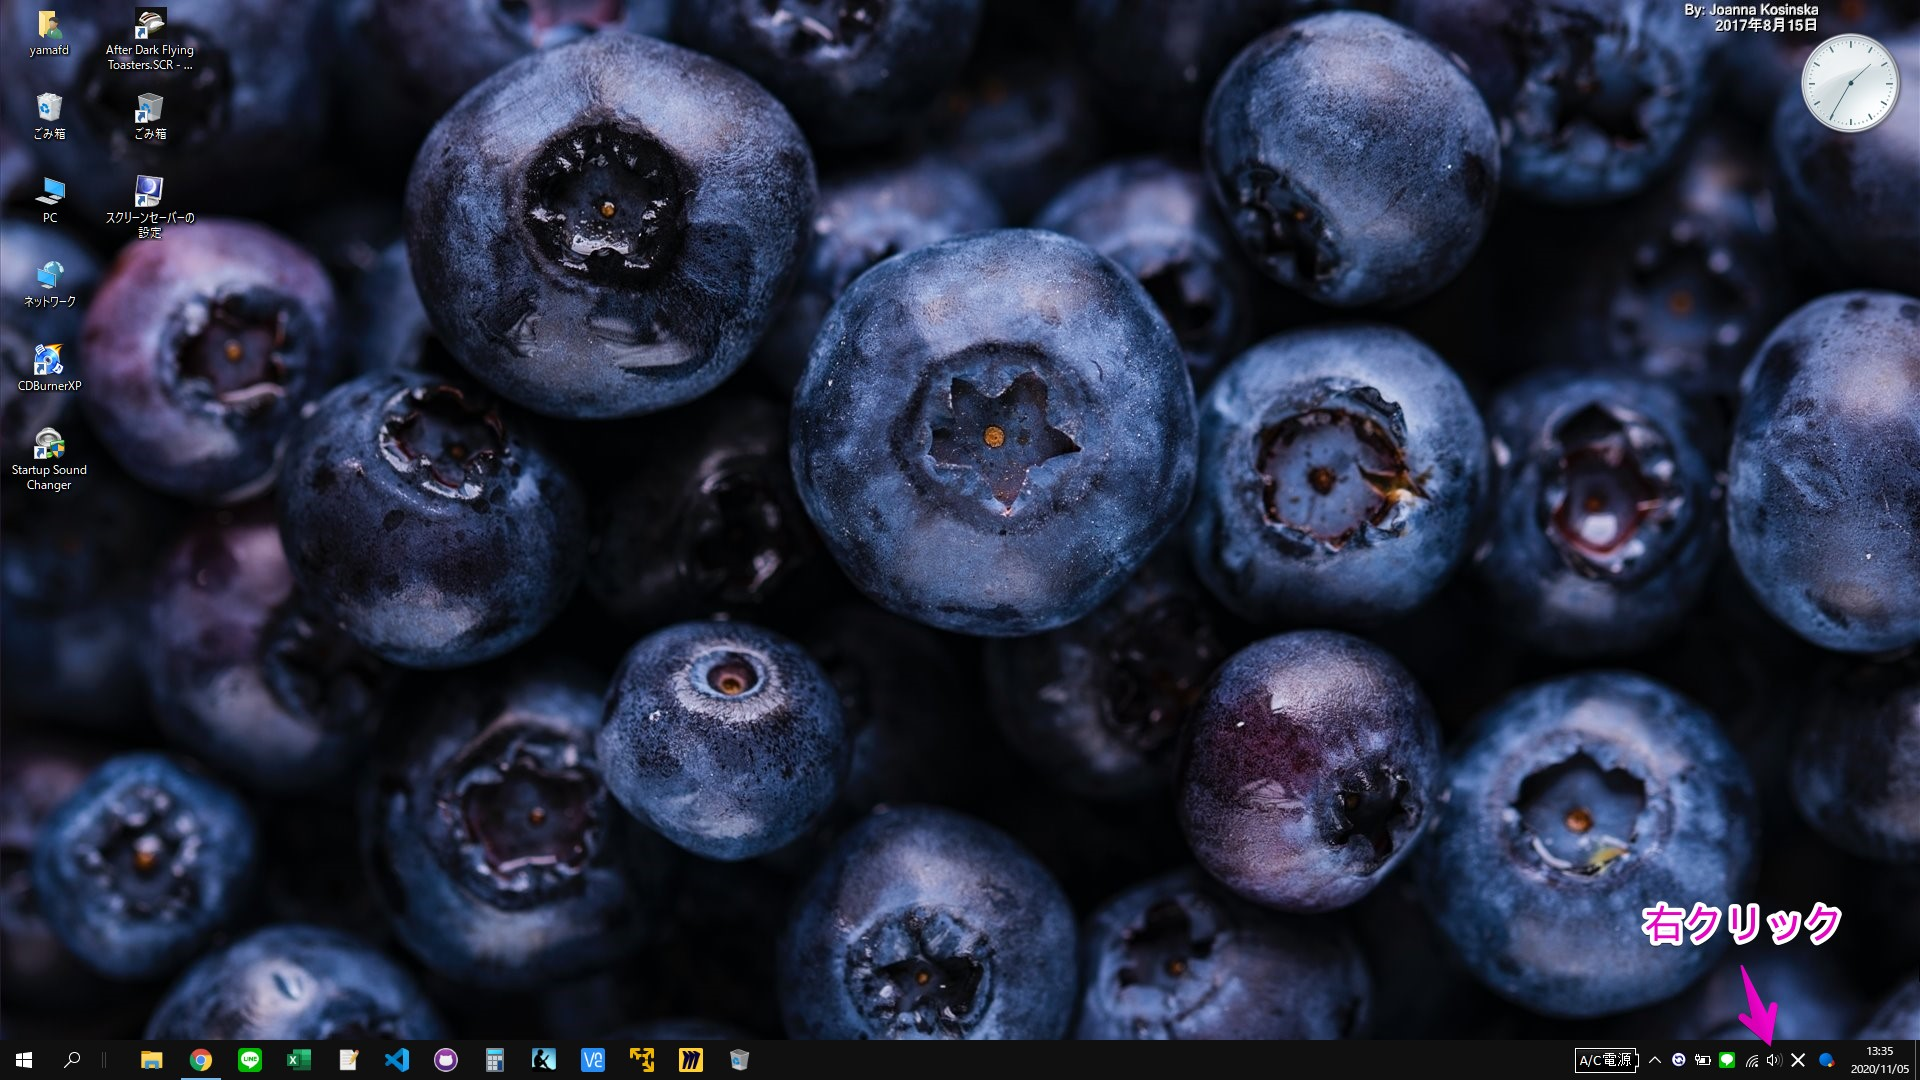 Windowsの「サウンド」アイコン